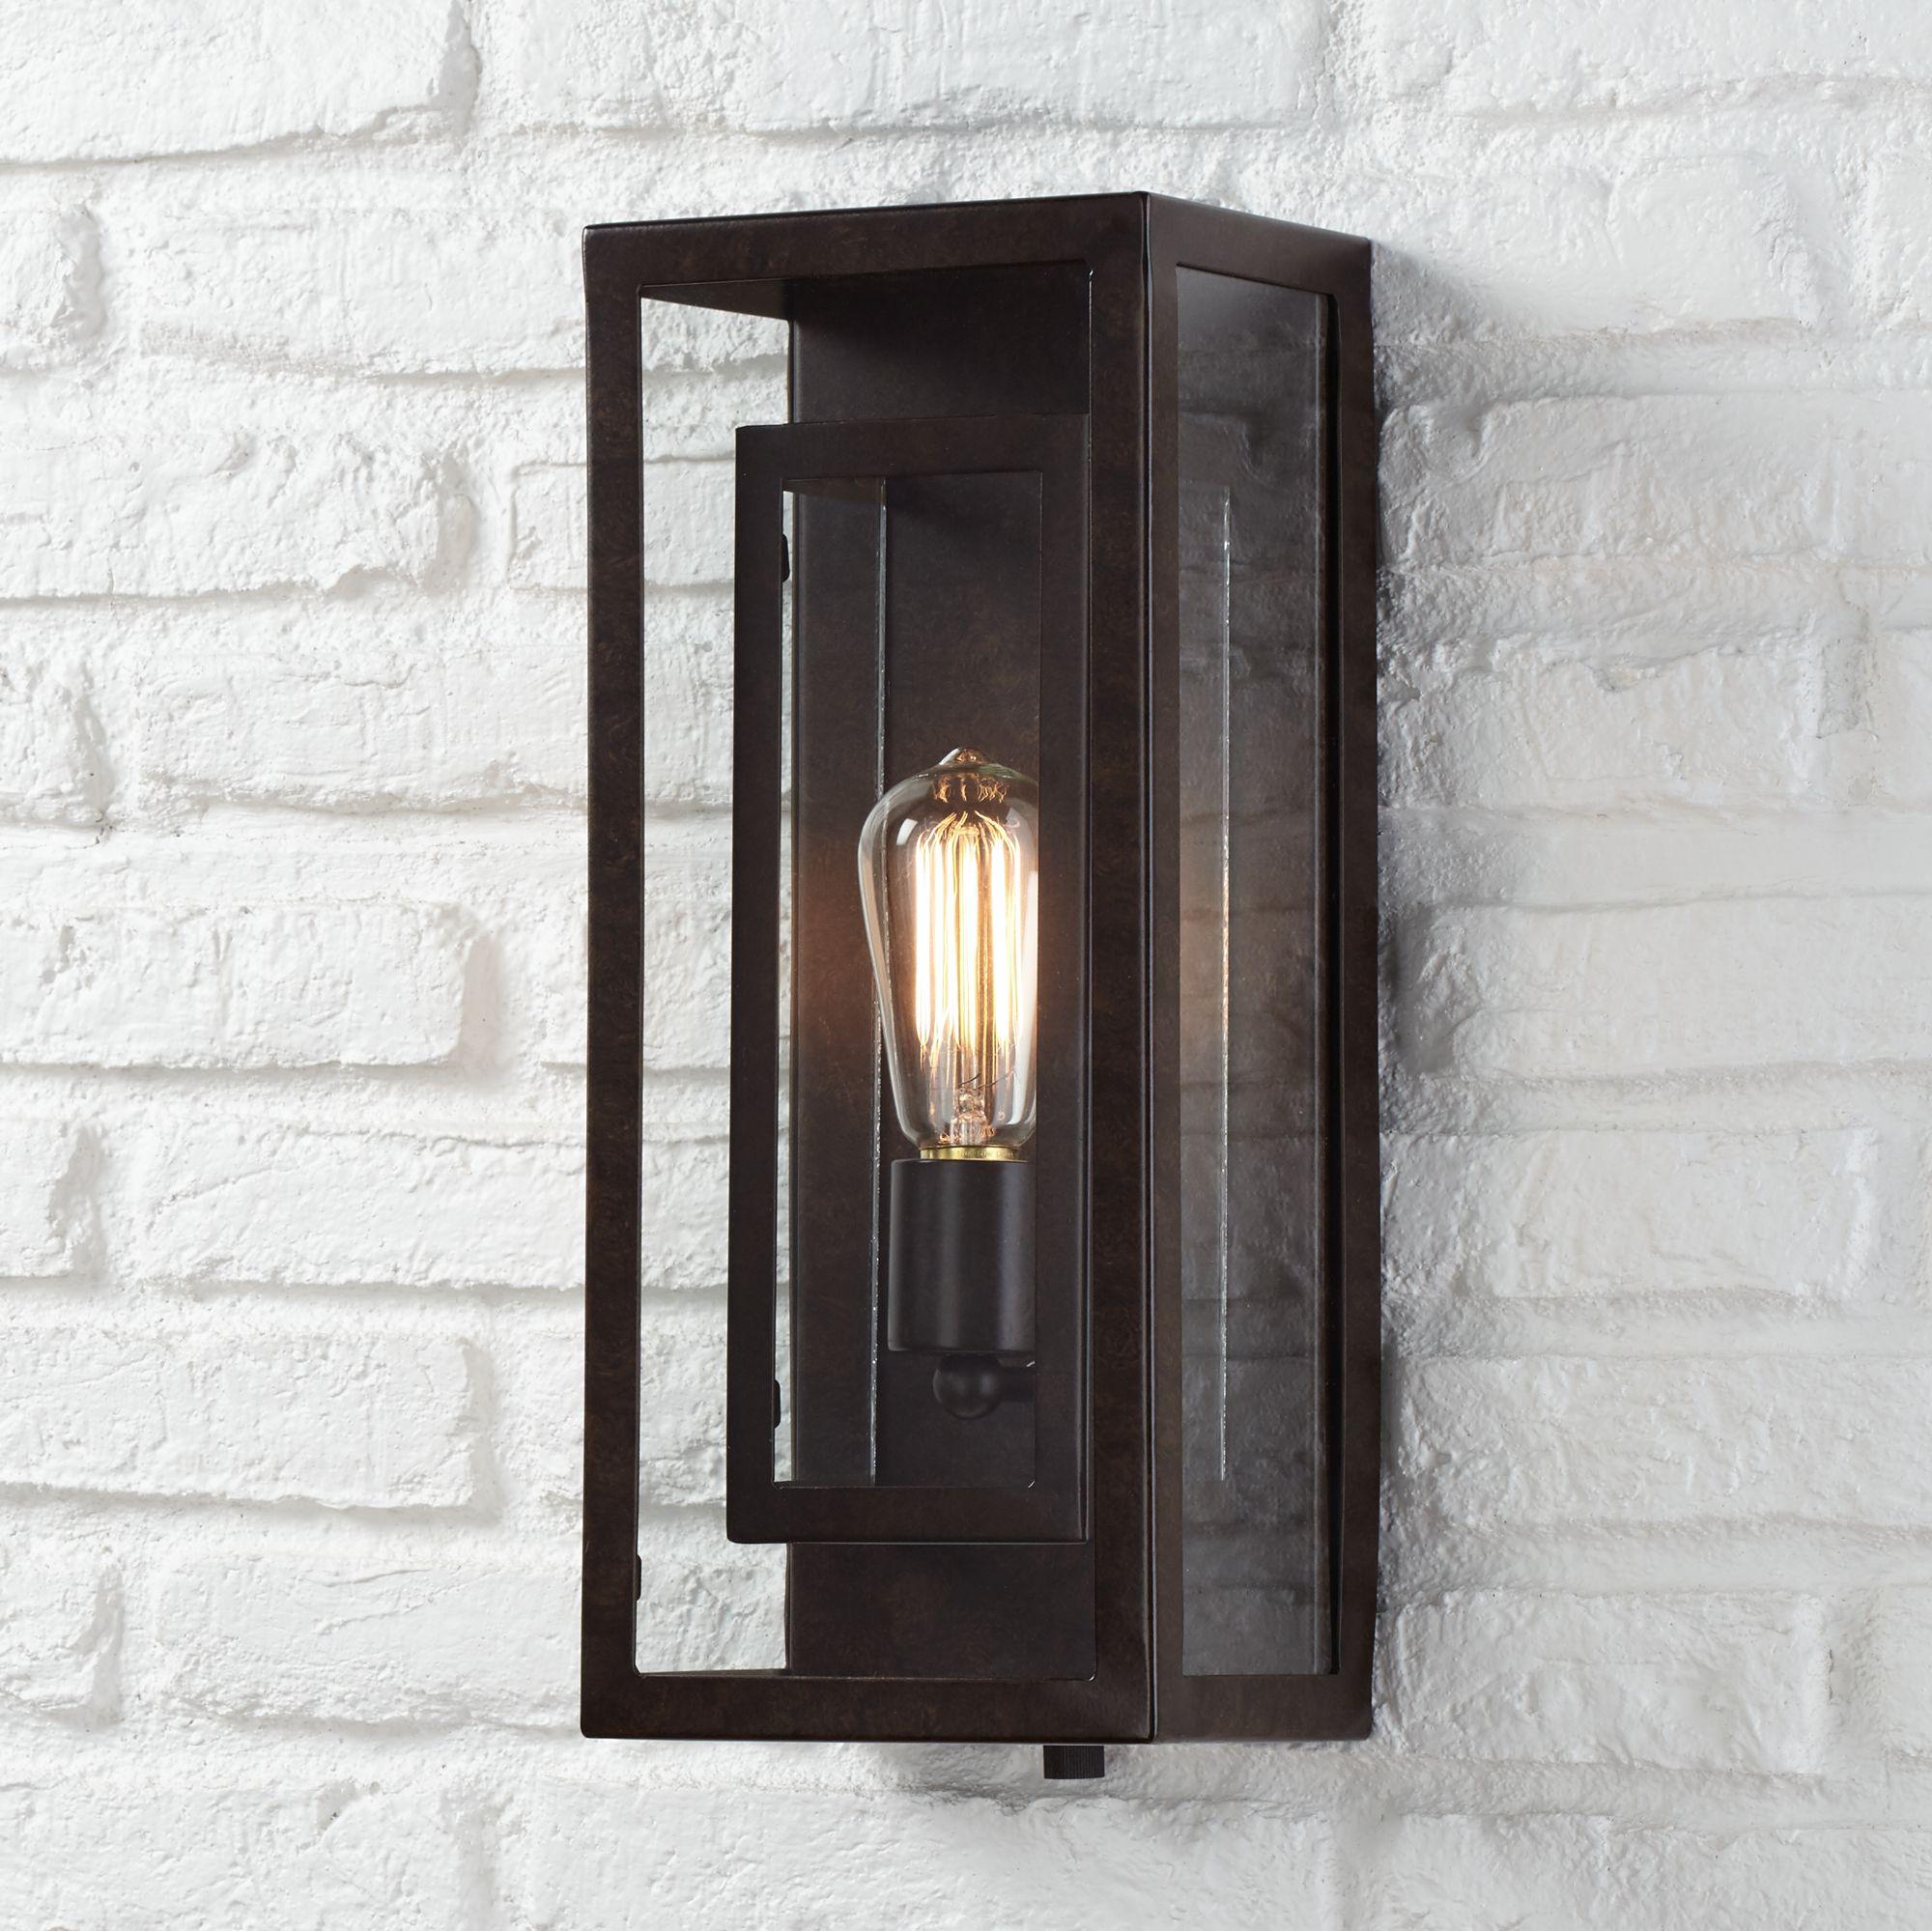 modern outdoor lamps double box 15 1/2 WXJAXYU